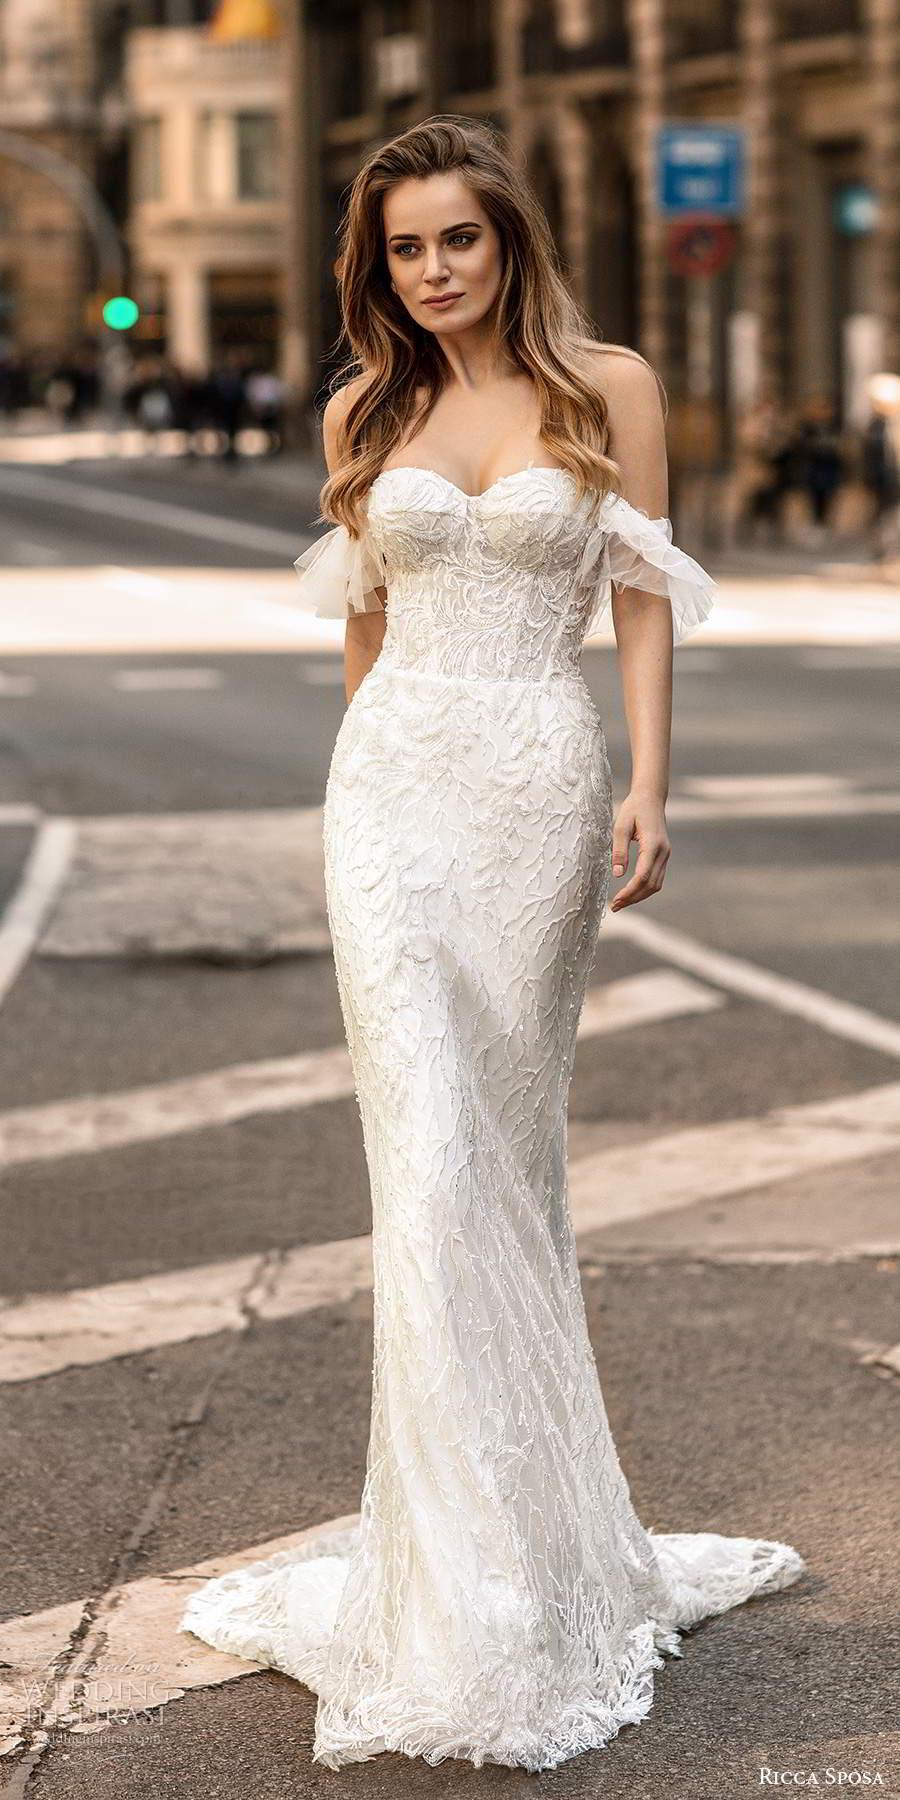 ricca sposa 2020 barcelona bridal off shoulder flutter sleeves semi sweetheart neckline fully embellished sheath mermaid wedding dress chapel train (22) mv